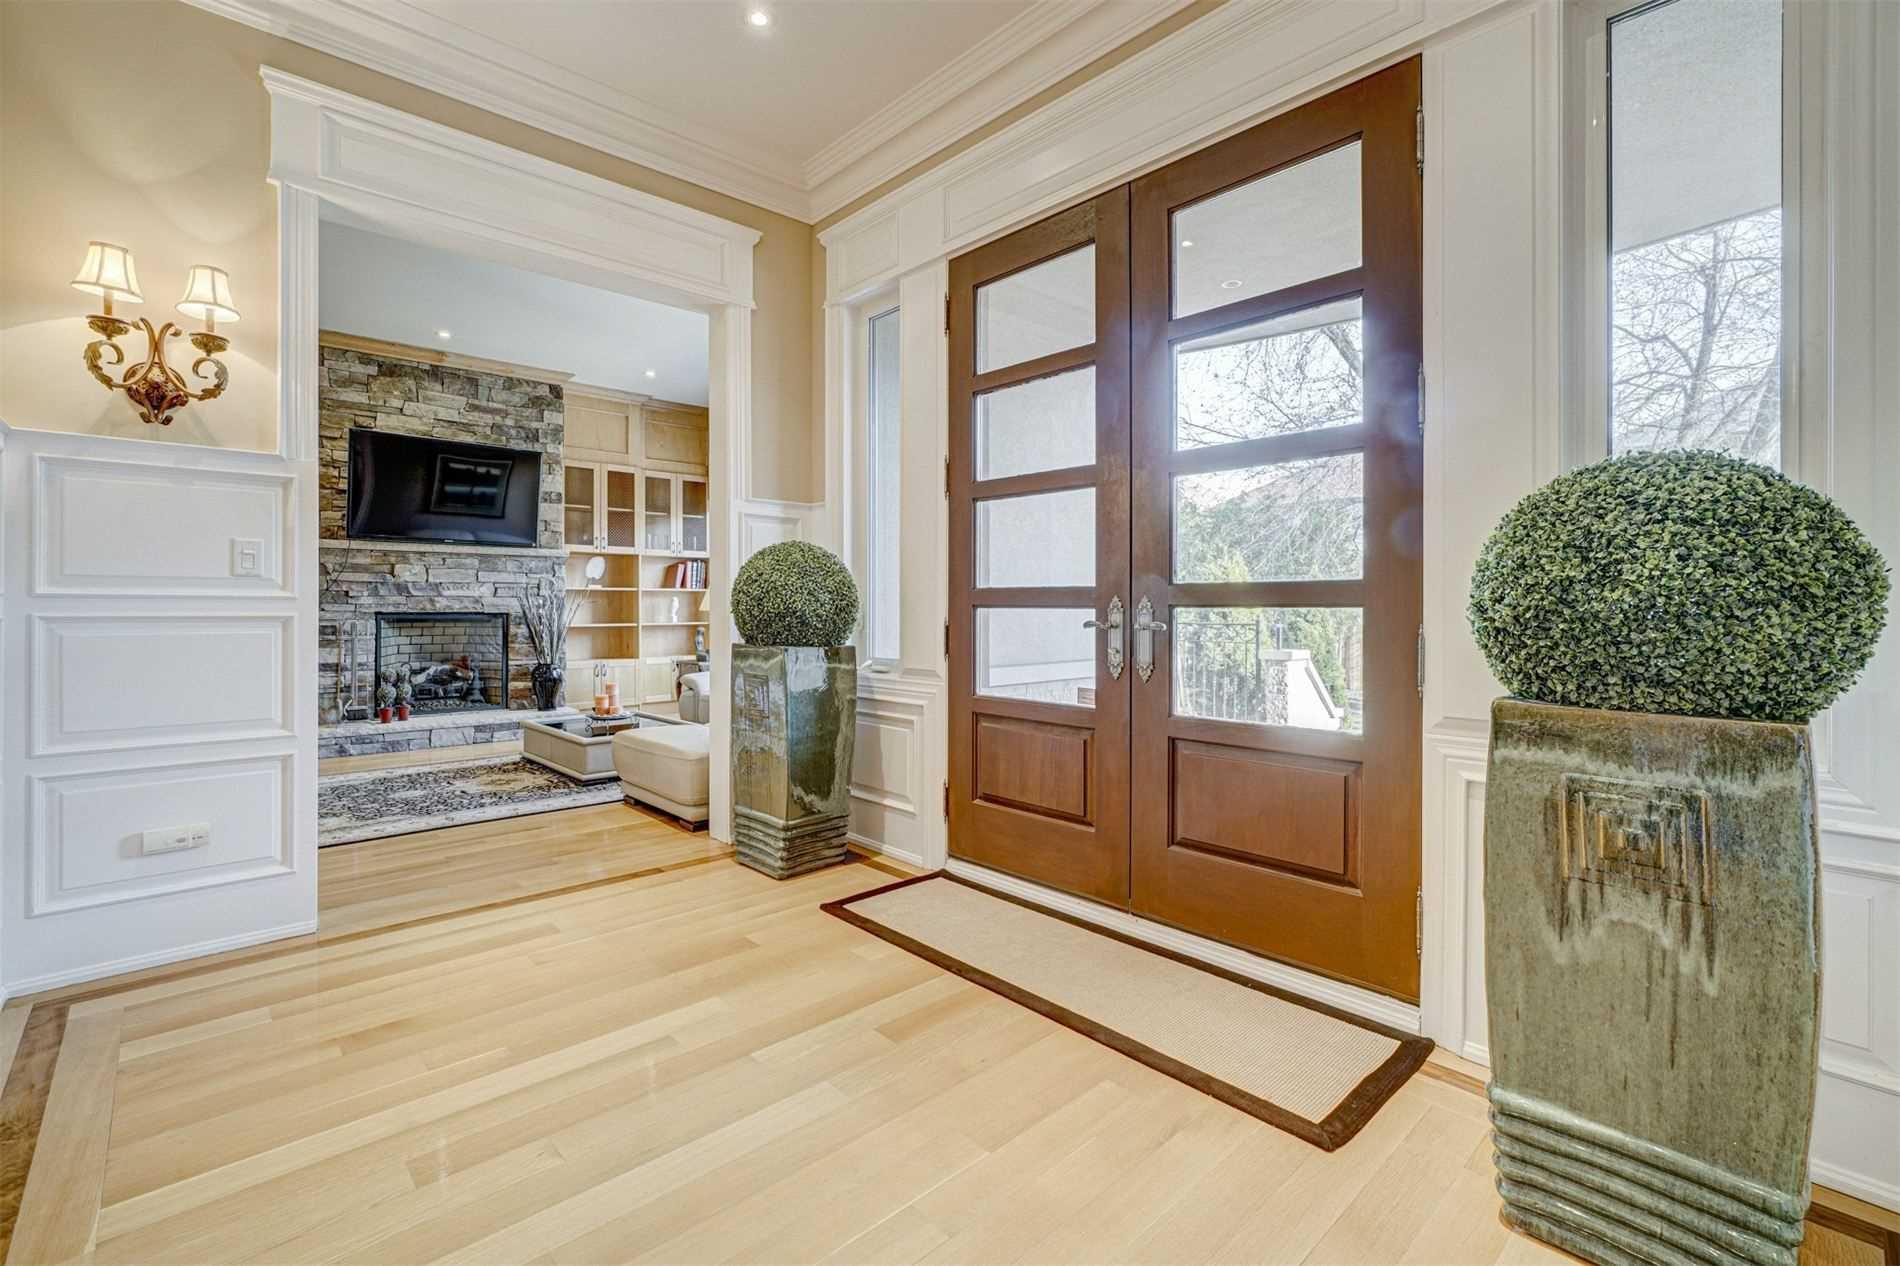 105 Duncan Rd - Langstaff Detached for sale, 4 Bedrooms (N5237187) - #11